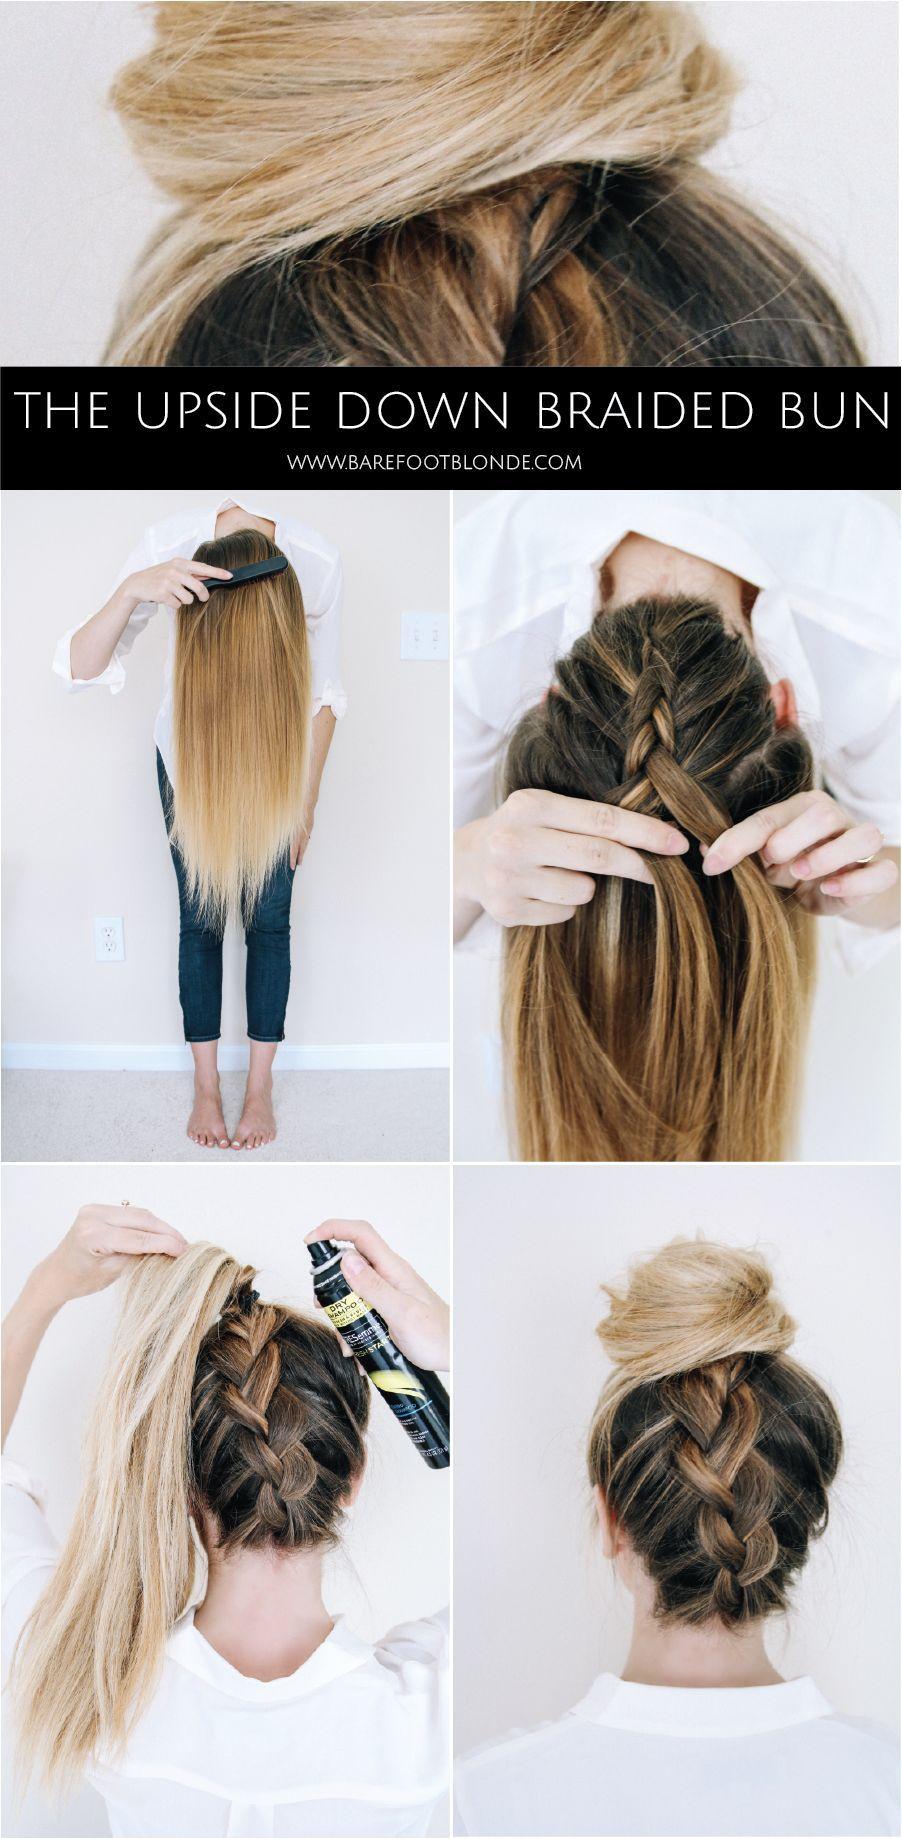 The upside down braided bun! | hairstyles | Pinterest | Blondes ...